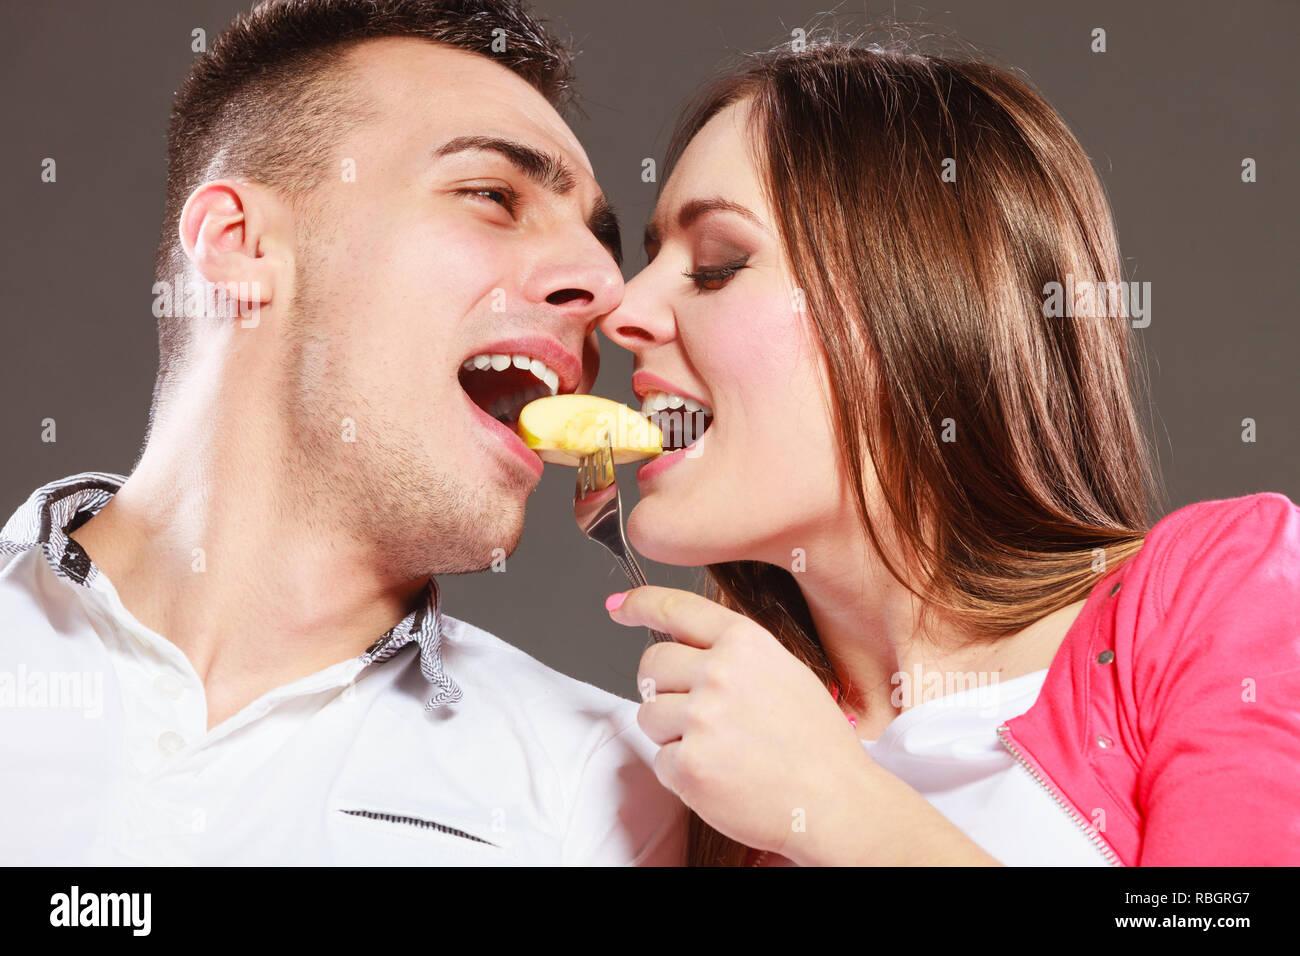 populaires sites de rencontres sexe